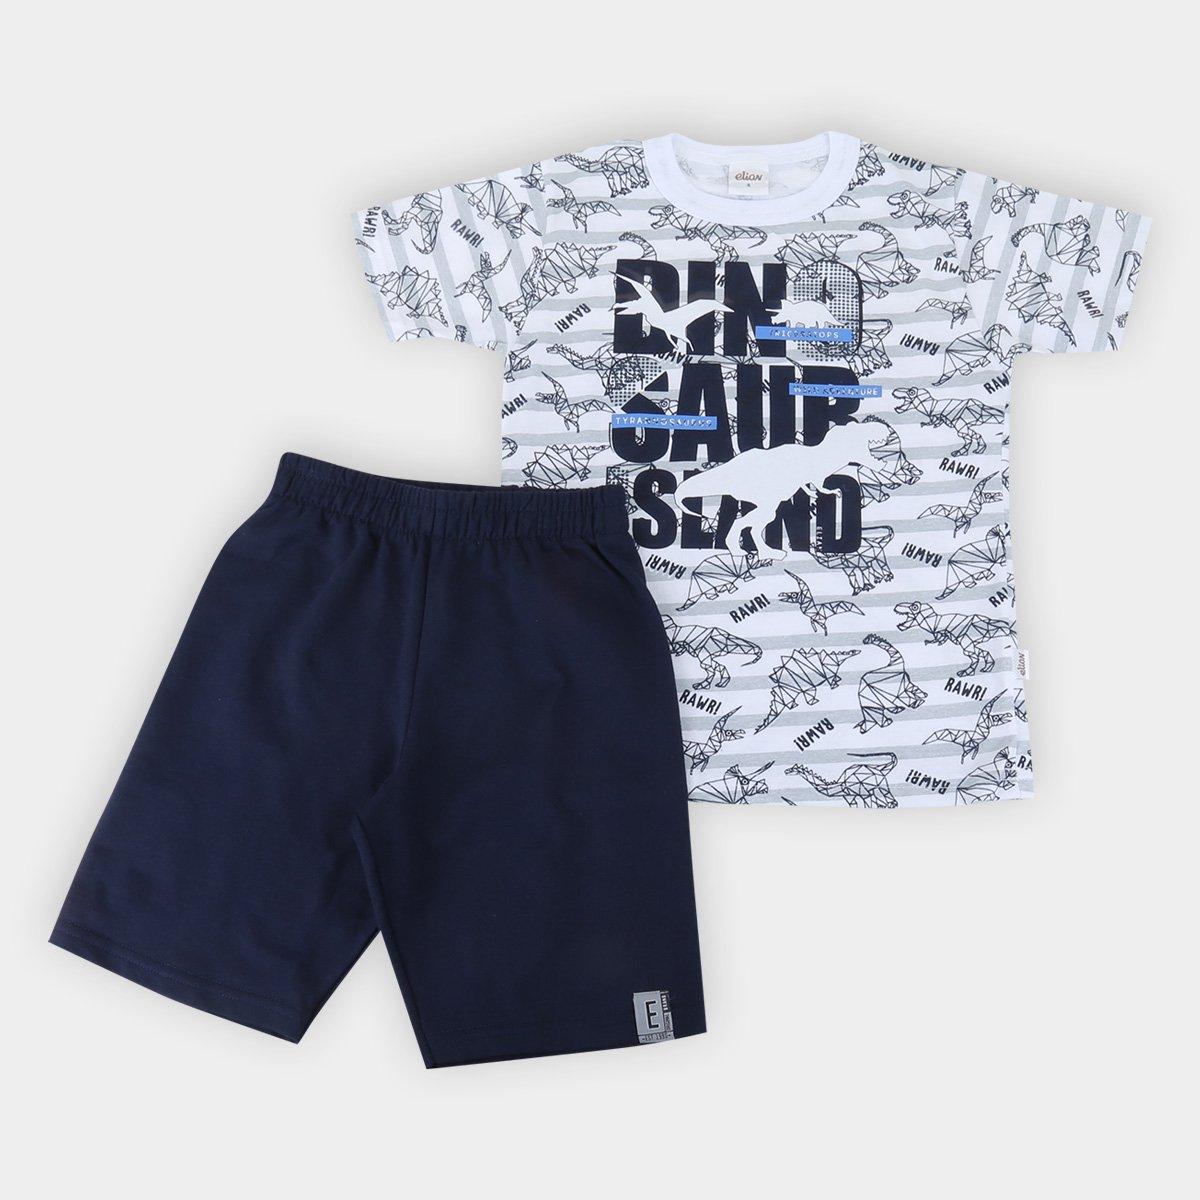 Conjunto Infantil Elian Camiseta Dinossauro e Bermuda Moletinho Masculino